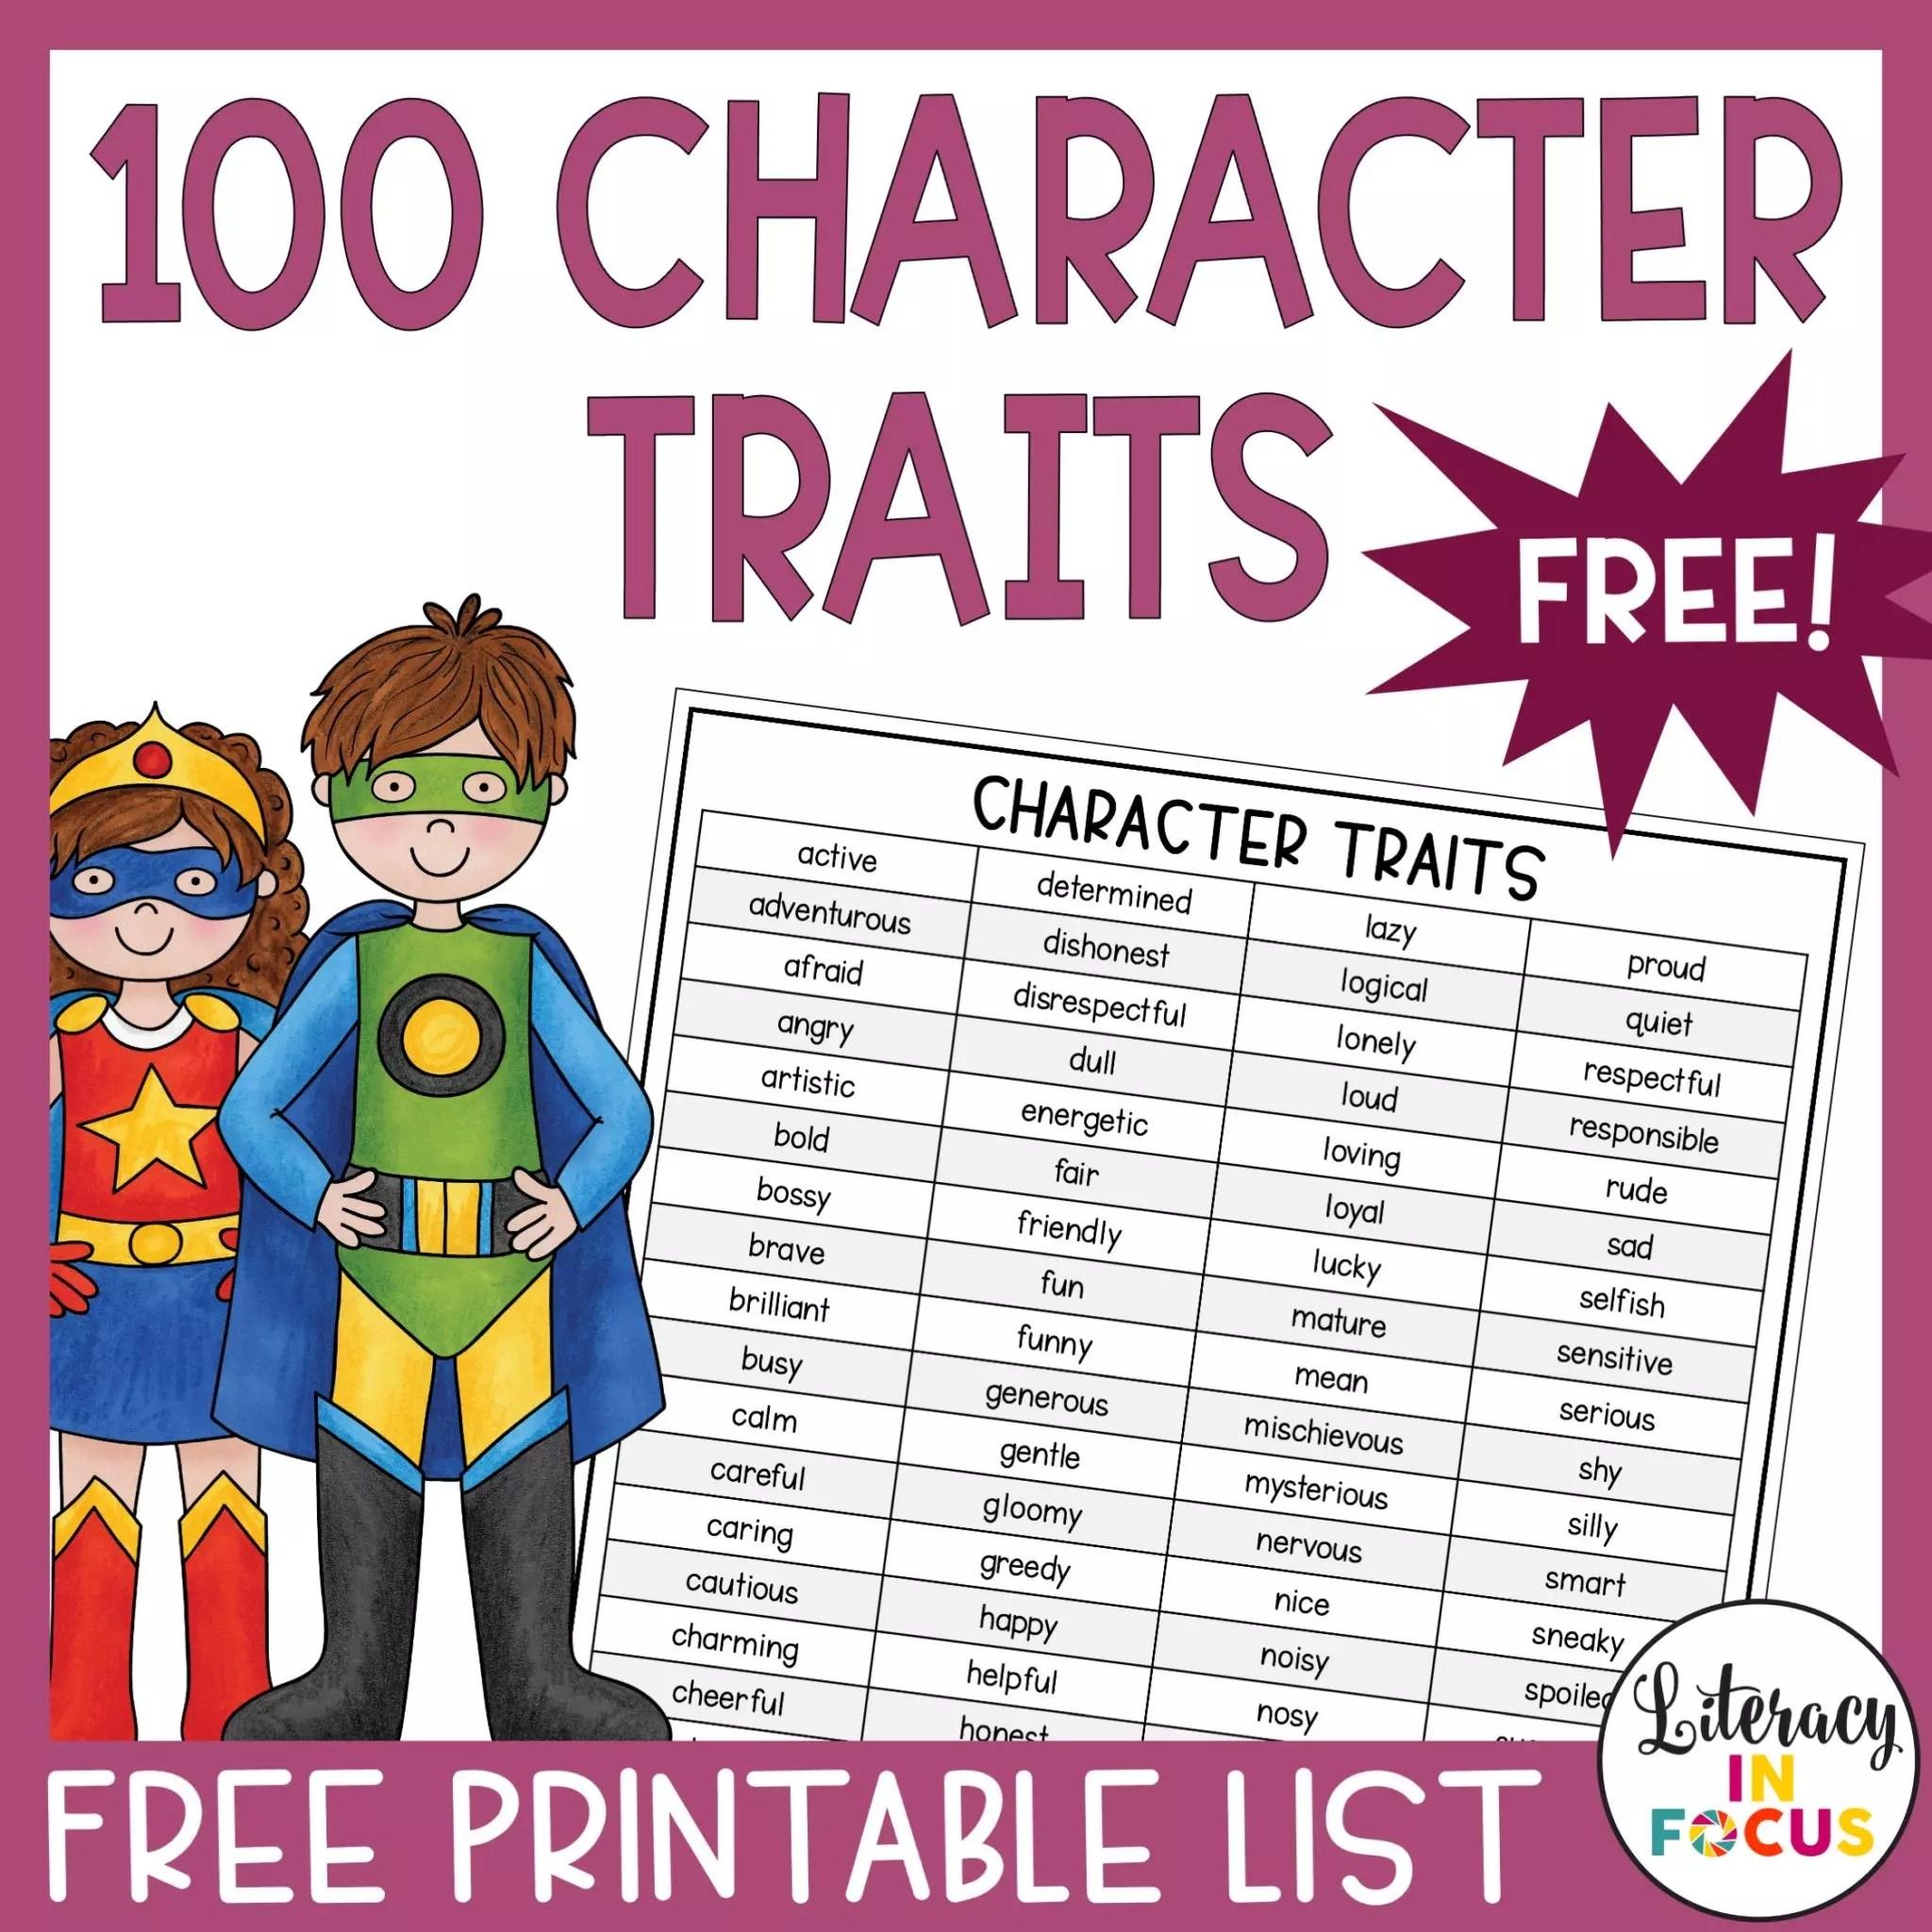 100 Character Traits List Free Printable